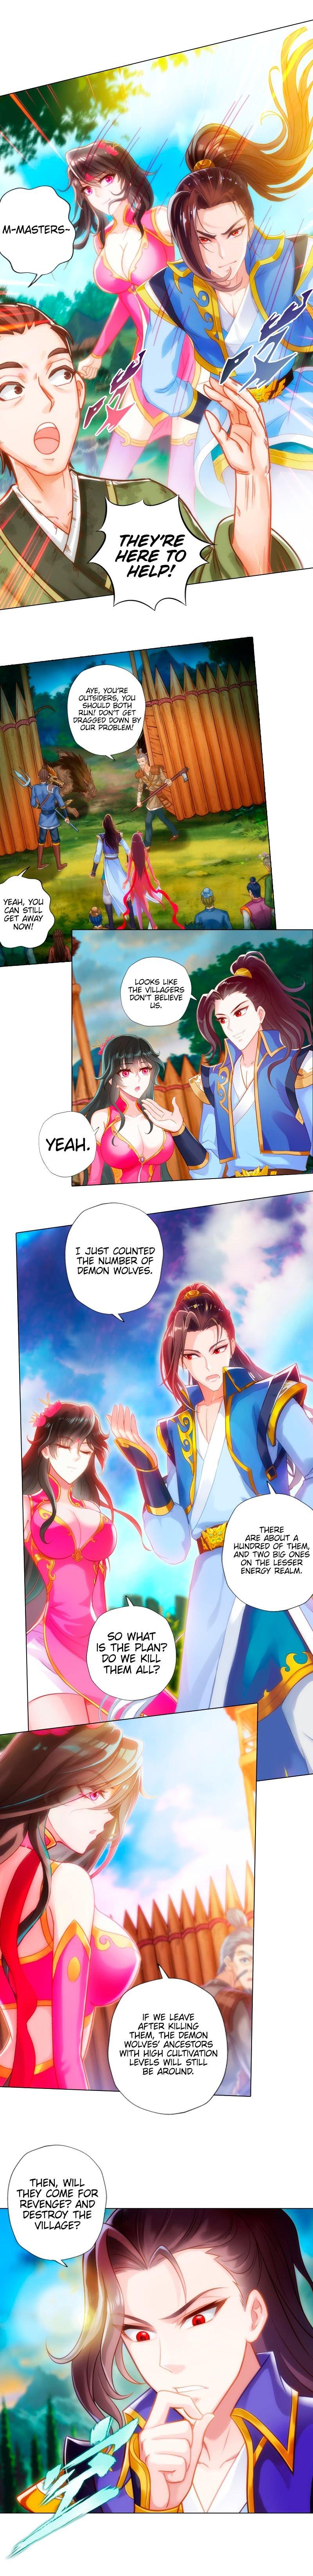 Manga Lang Huan Library - Chapter 82 Page 8